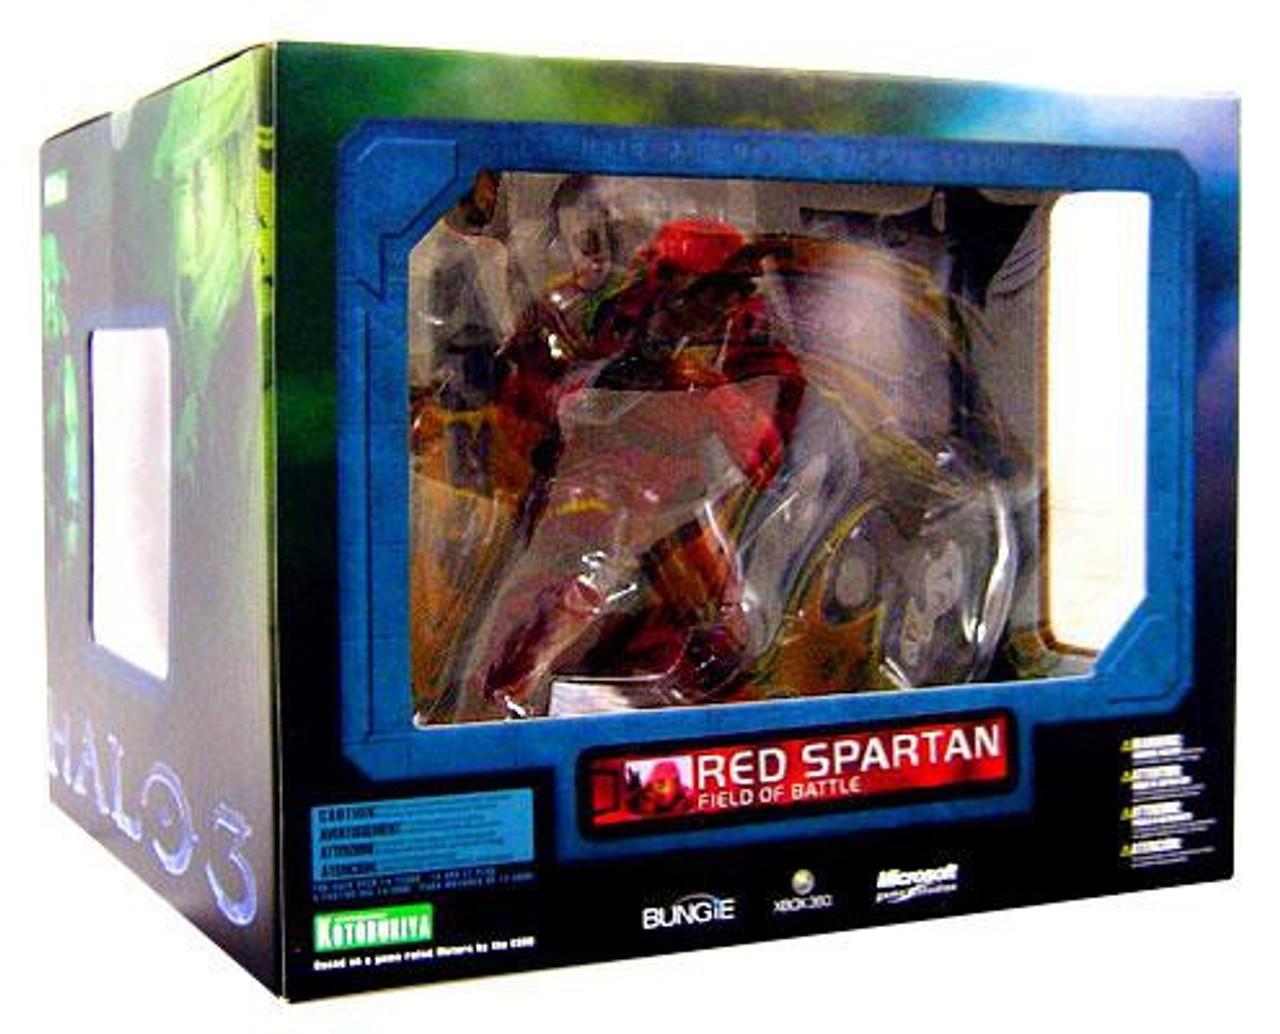 Halo 3 ArtFX Red Spartan 11-Inch Statue Figure [Field of Battle]